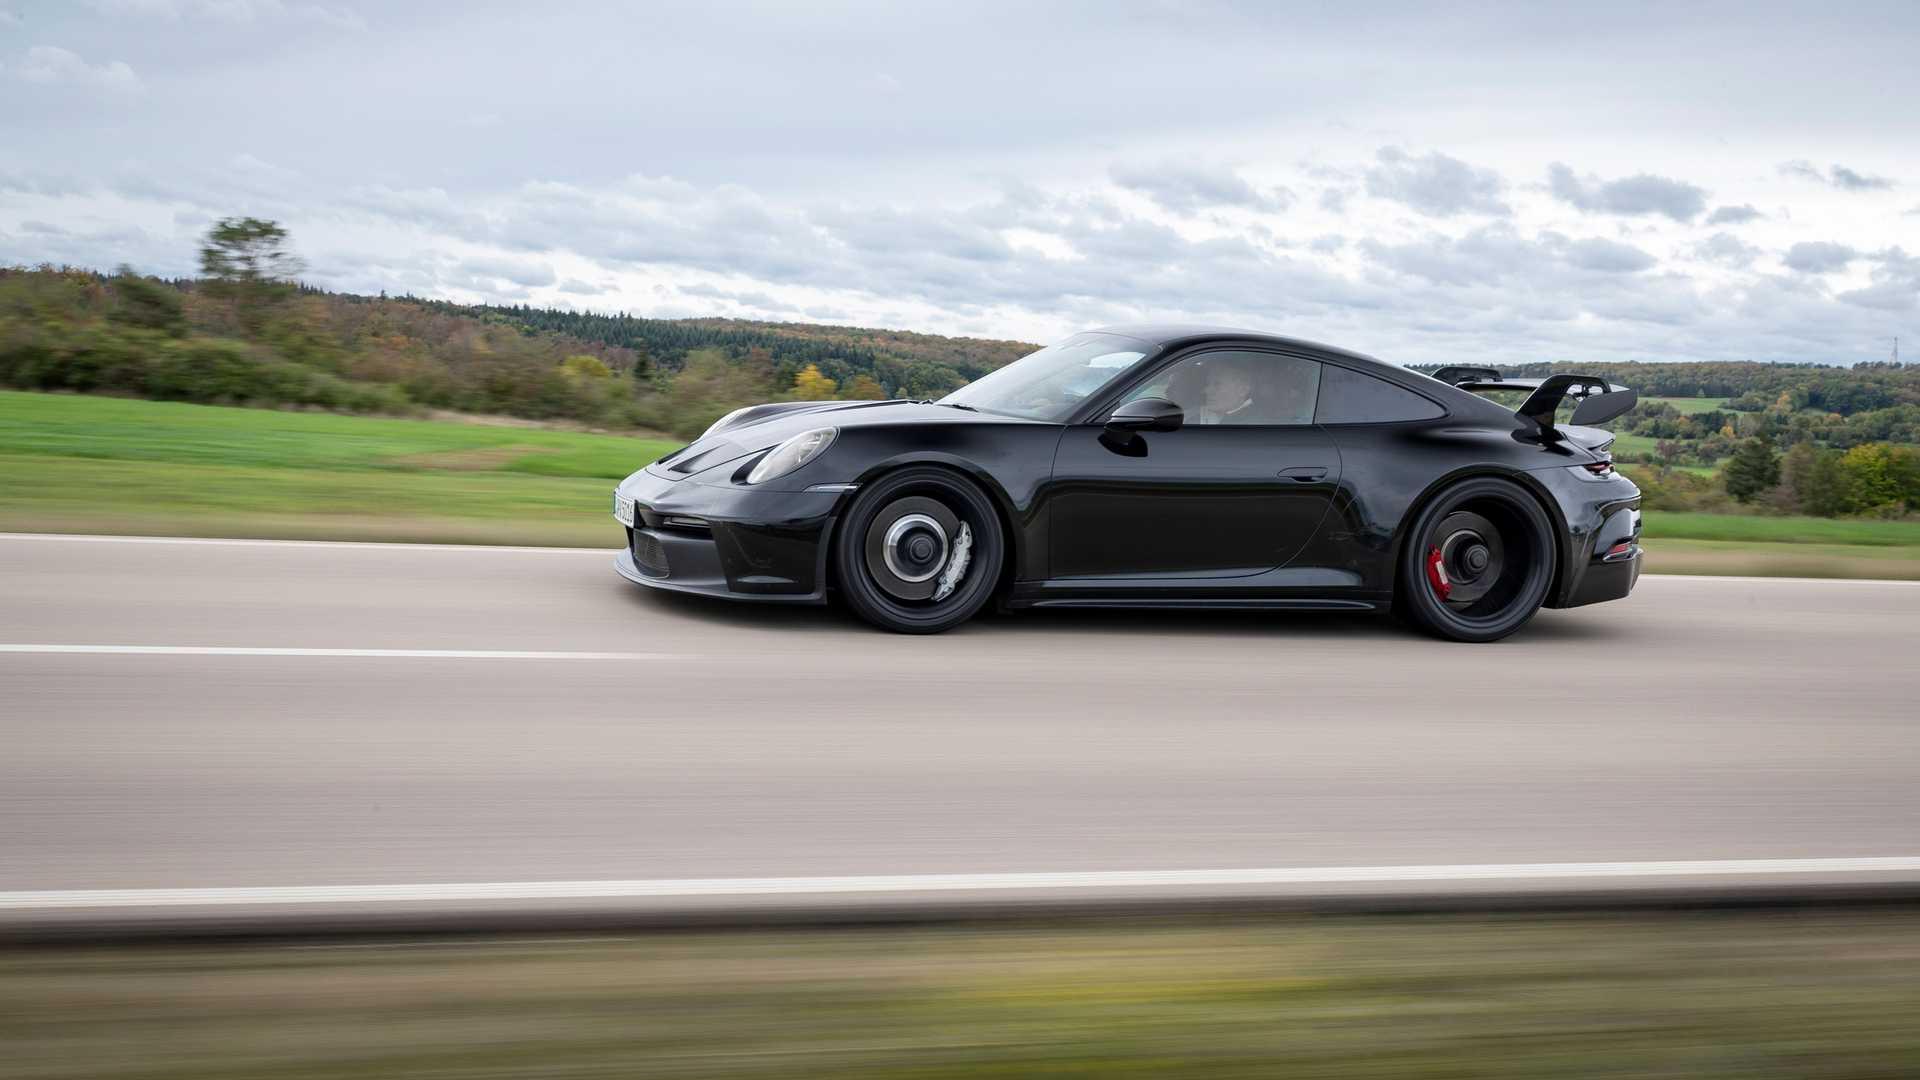 2021-porsche-911-gt3-prototype-profile-tracking